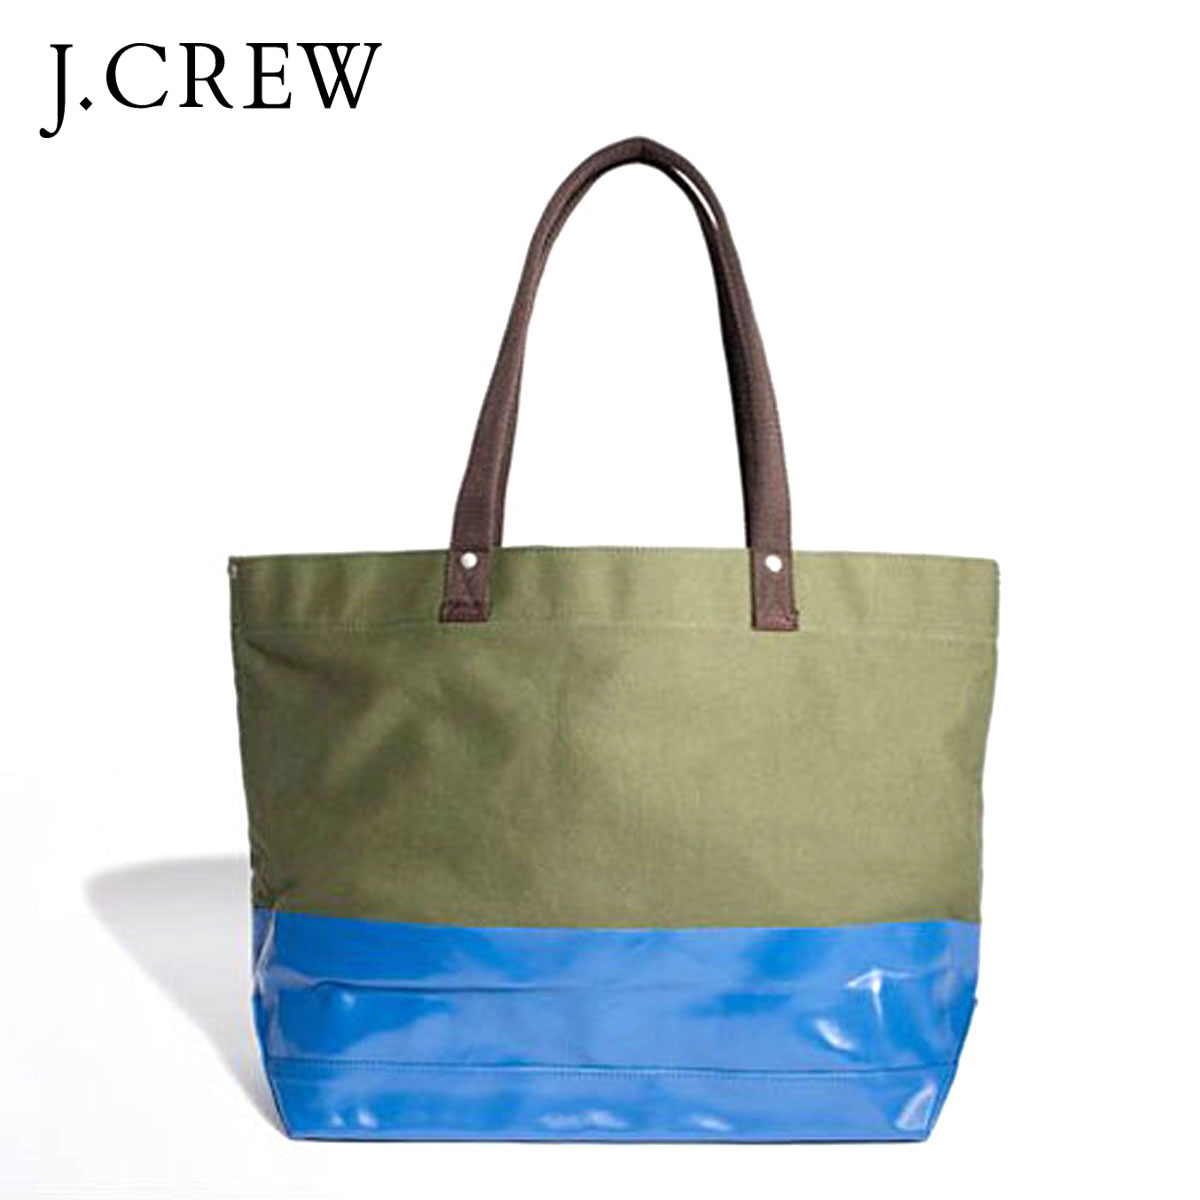 50 Off J Crew Bag Men S Regular Article Tote Colorblock Canvas H35xw37xd17 Olive D